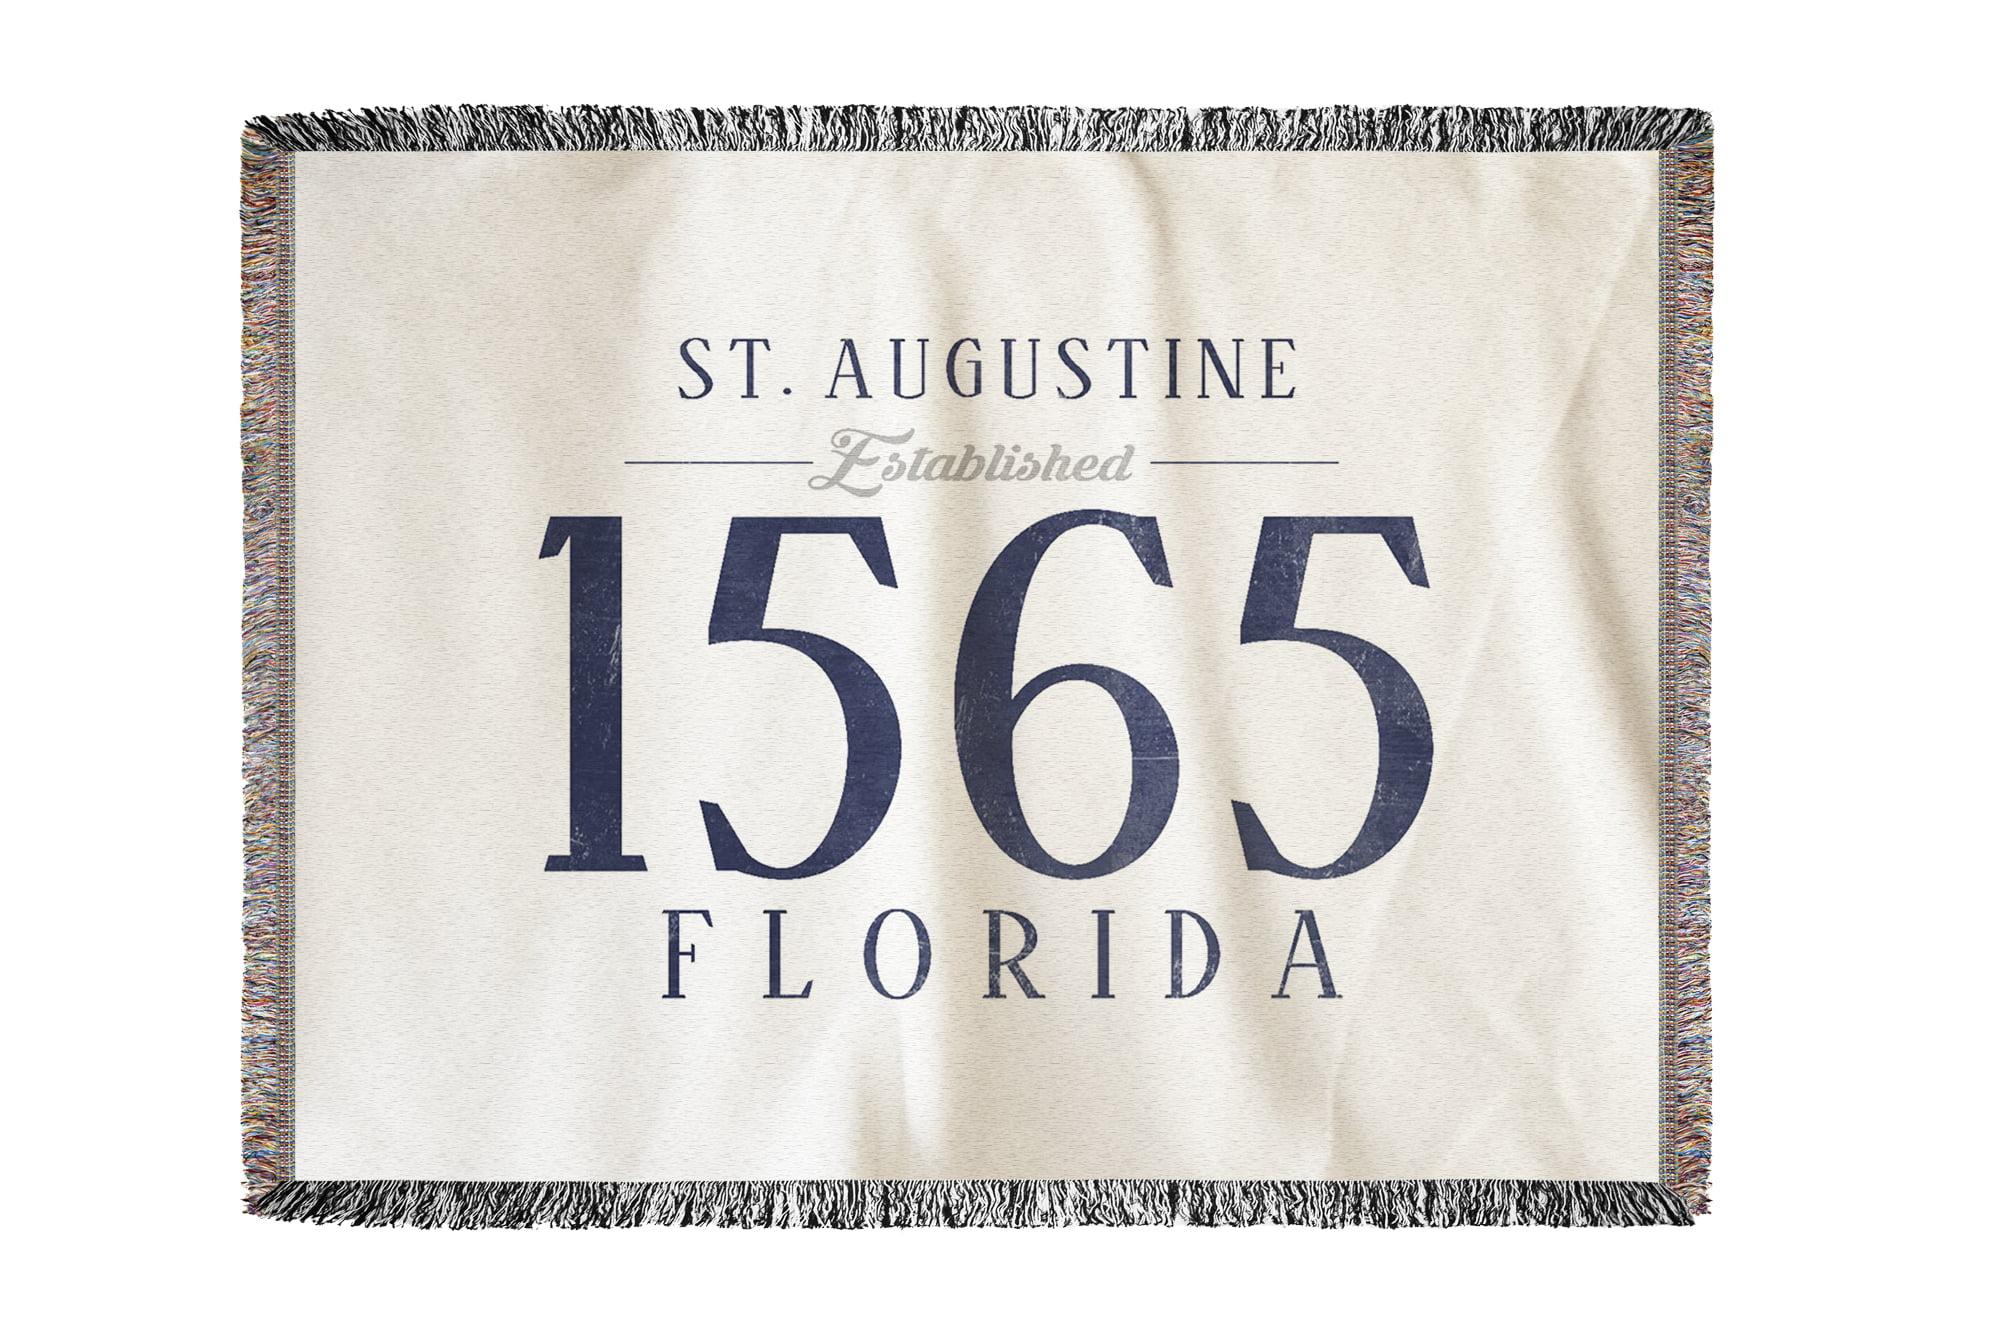 St Augustine Florida dating